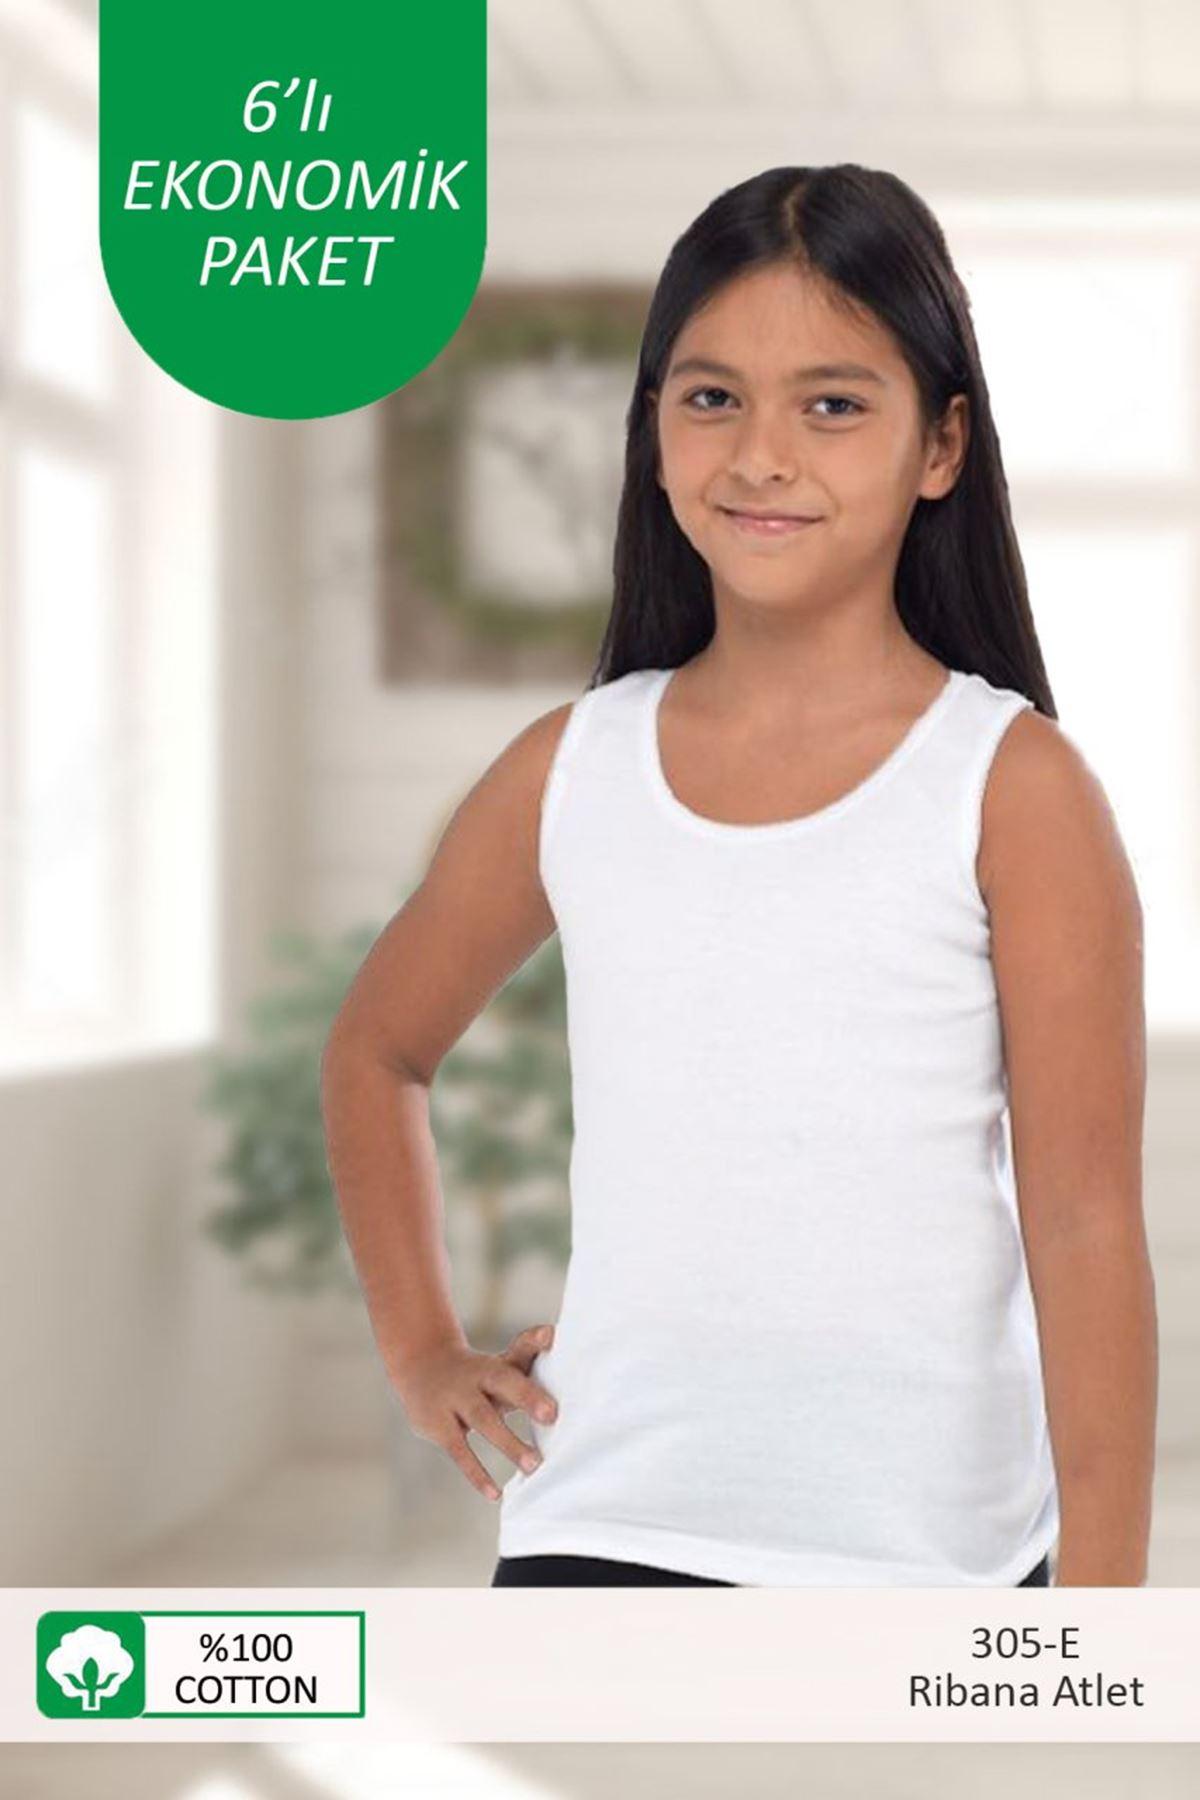 Beyaz Kız Çocuk 6 ' Lı Paket E-Serisi Ribana Cotton Atlet 305-E